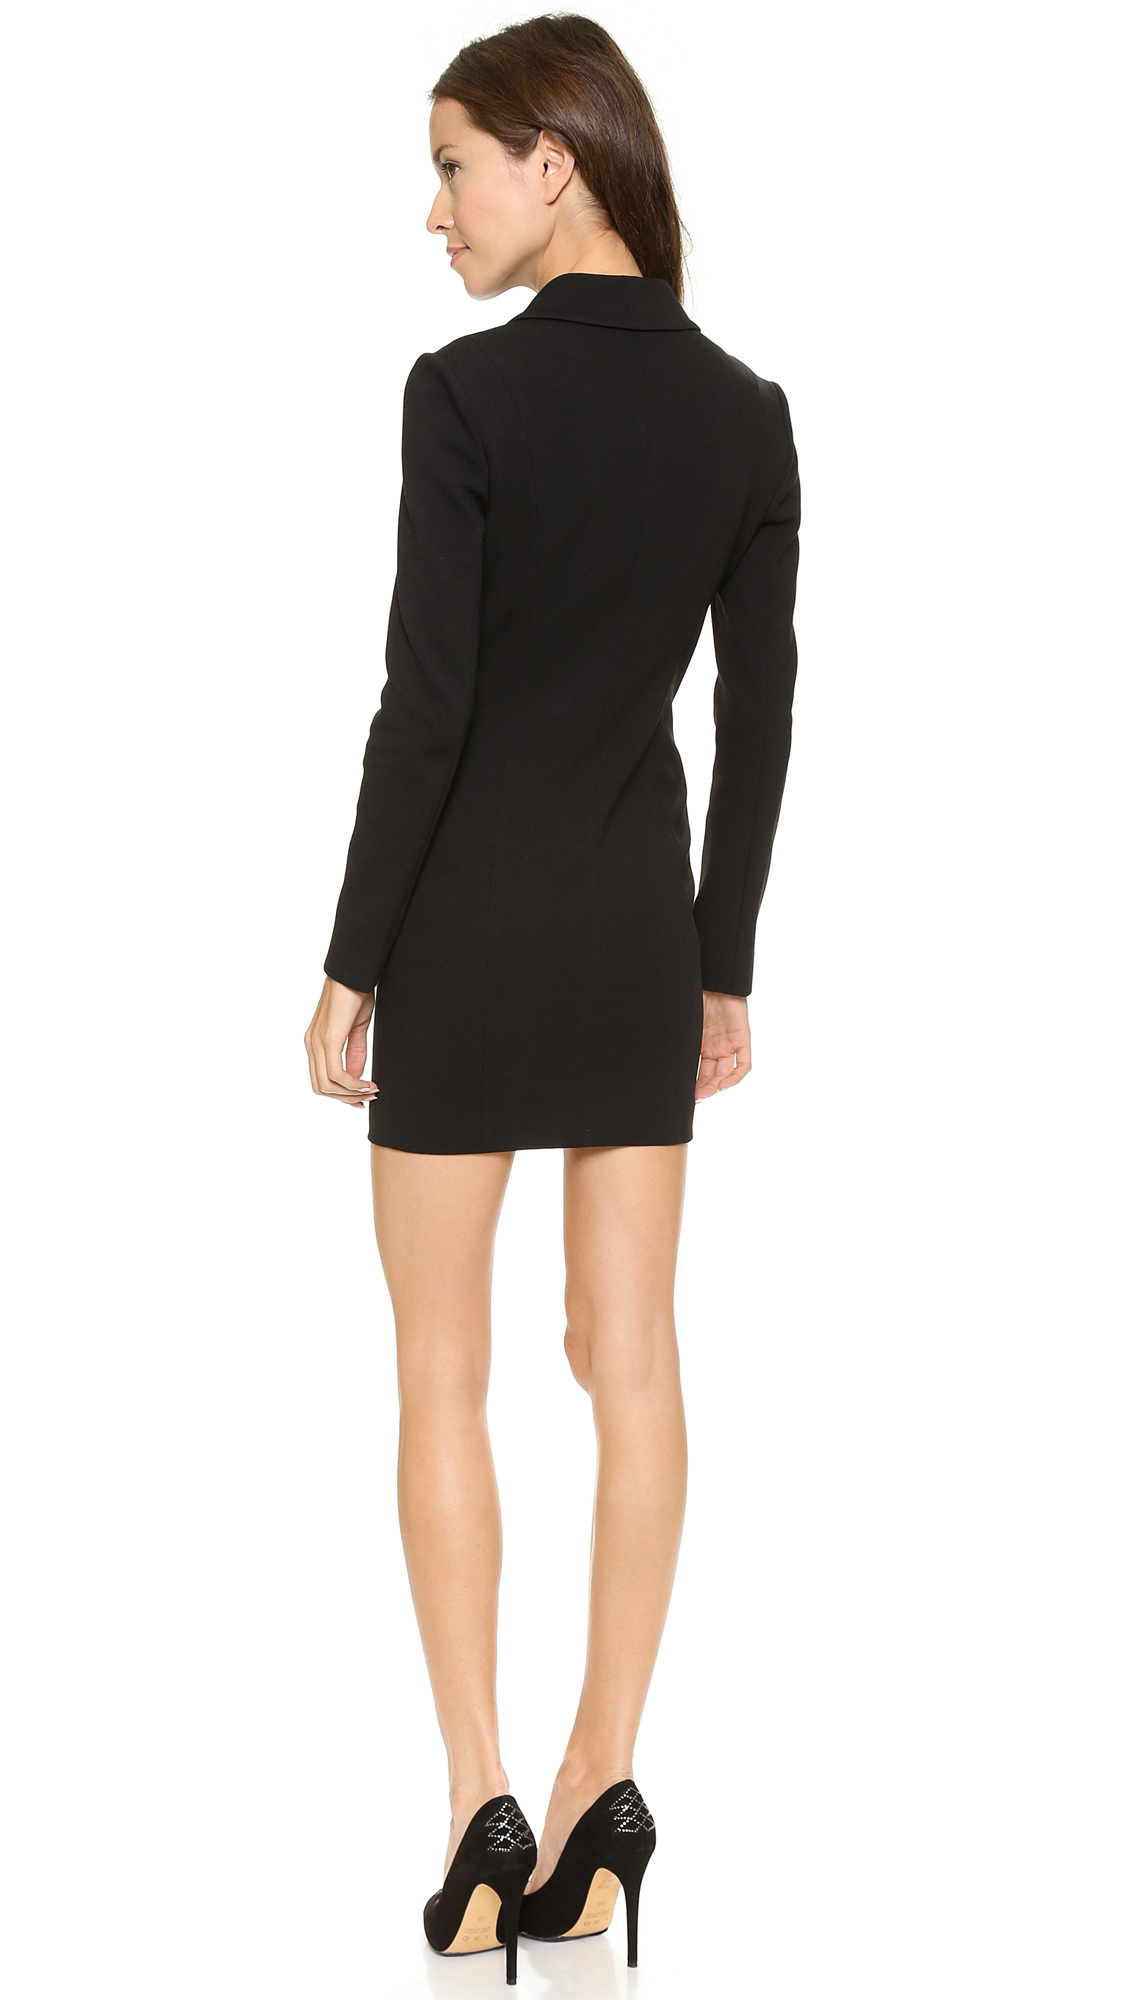 fe70797198 Balmain Zip Up Blazer Dress Black in Black - Lyst